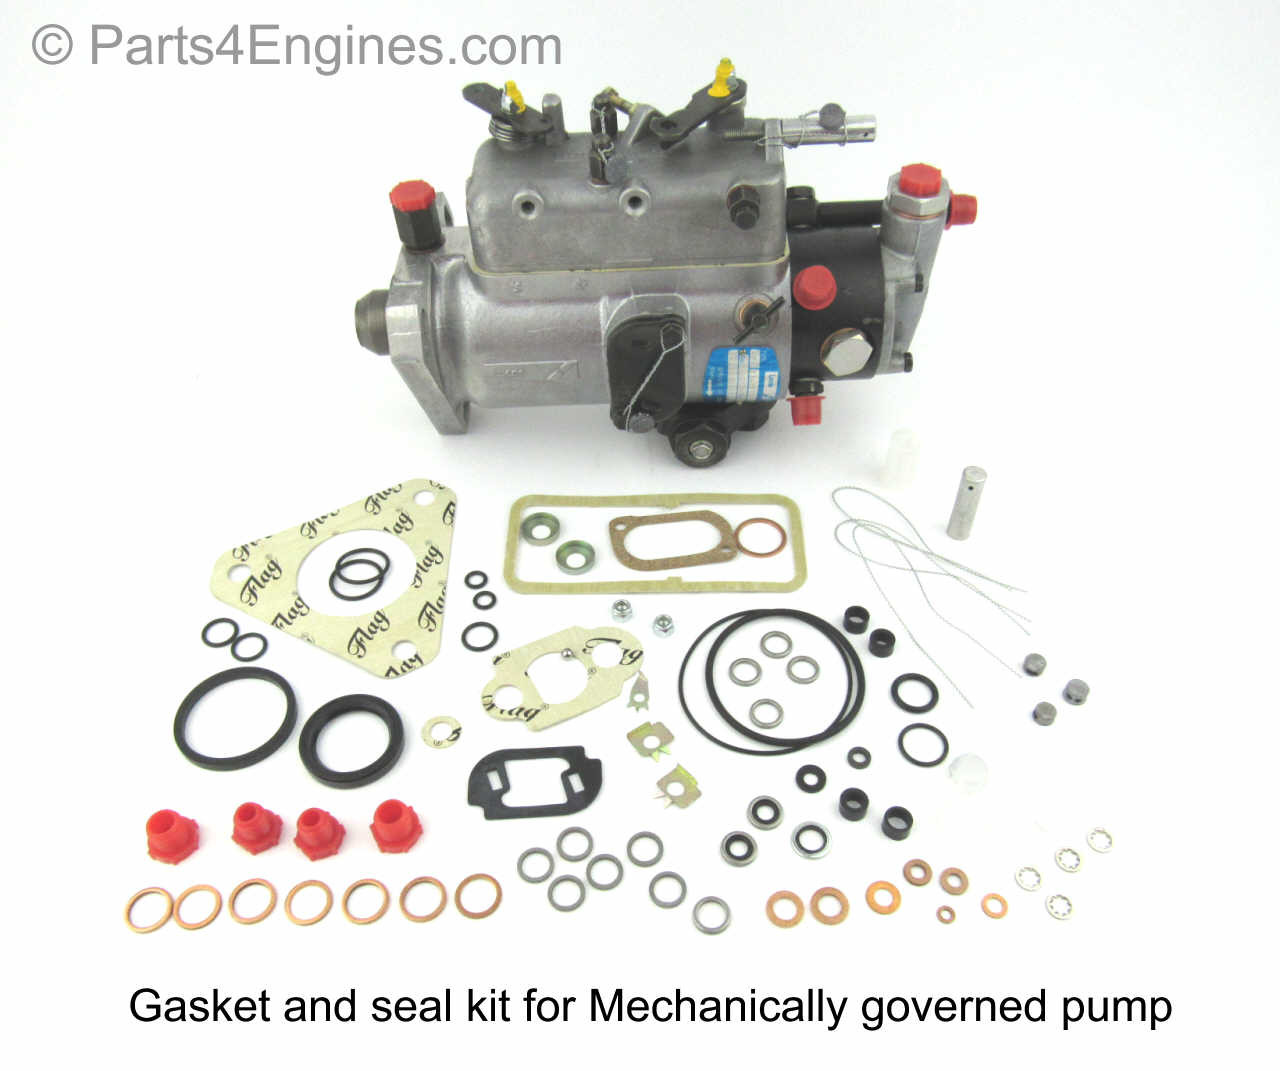 perkins 6 354 gasket seal kit for mechanical governed injection pump [ 1280 x 1071 Pixel ]